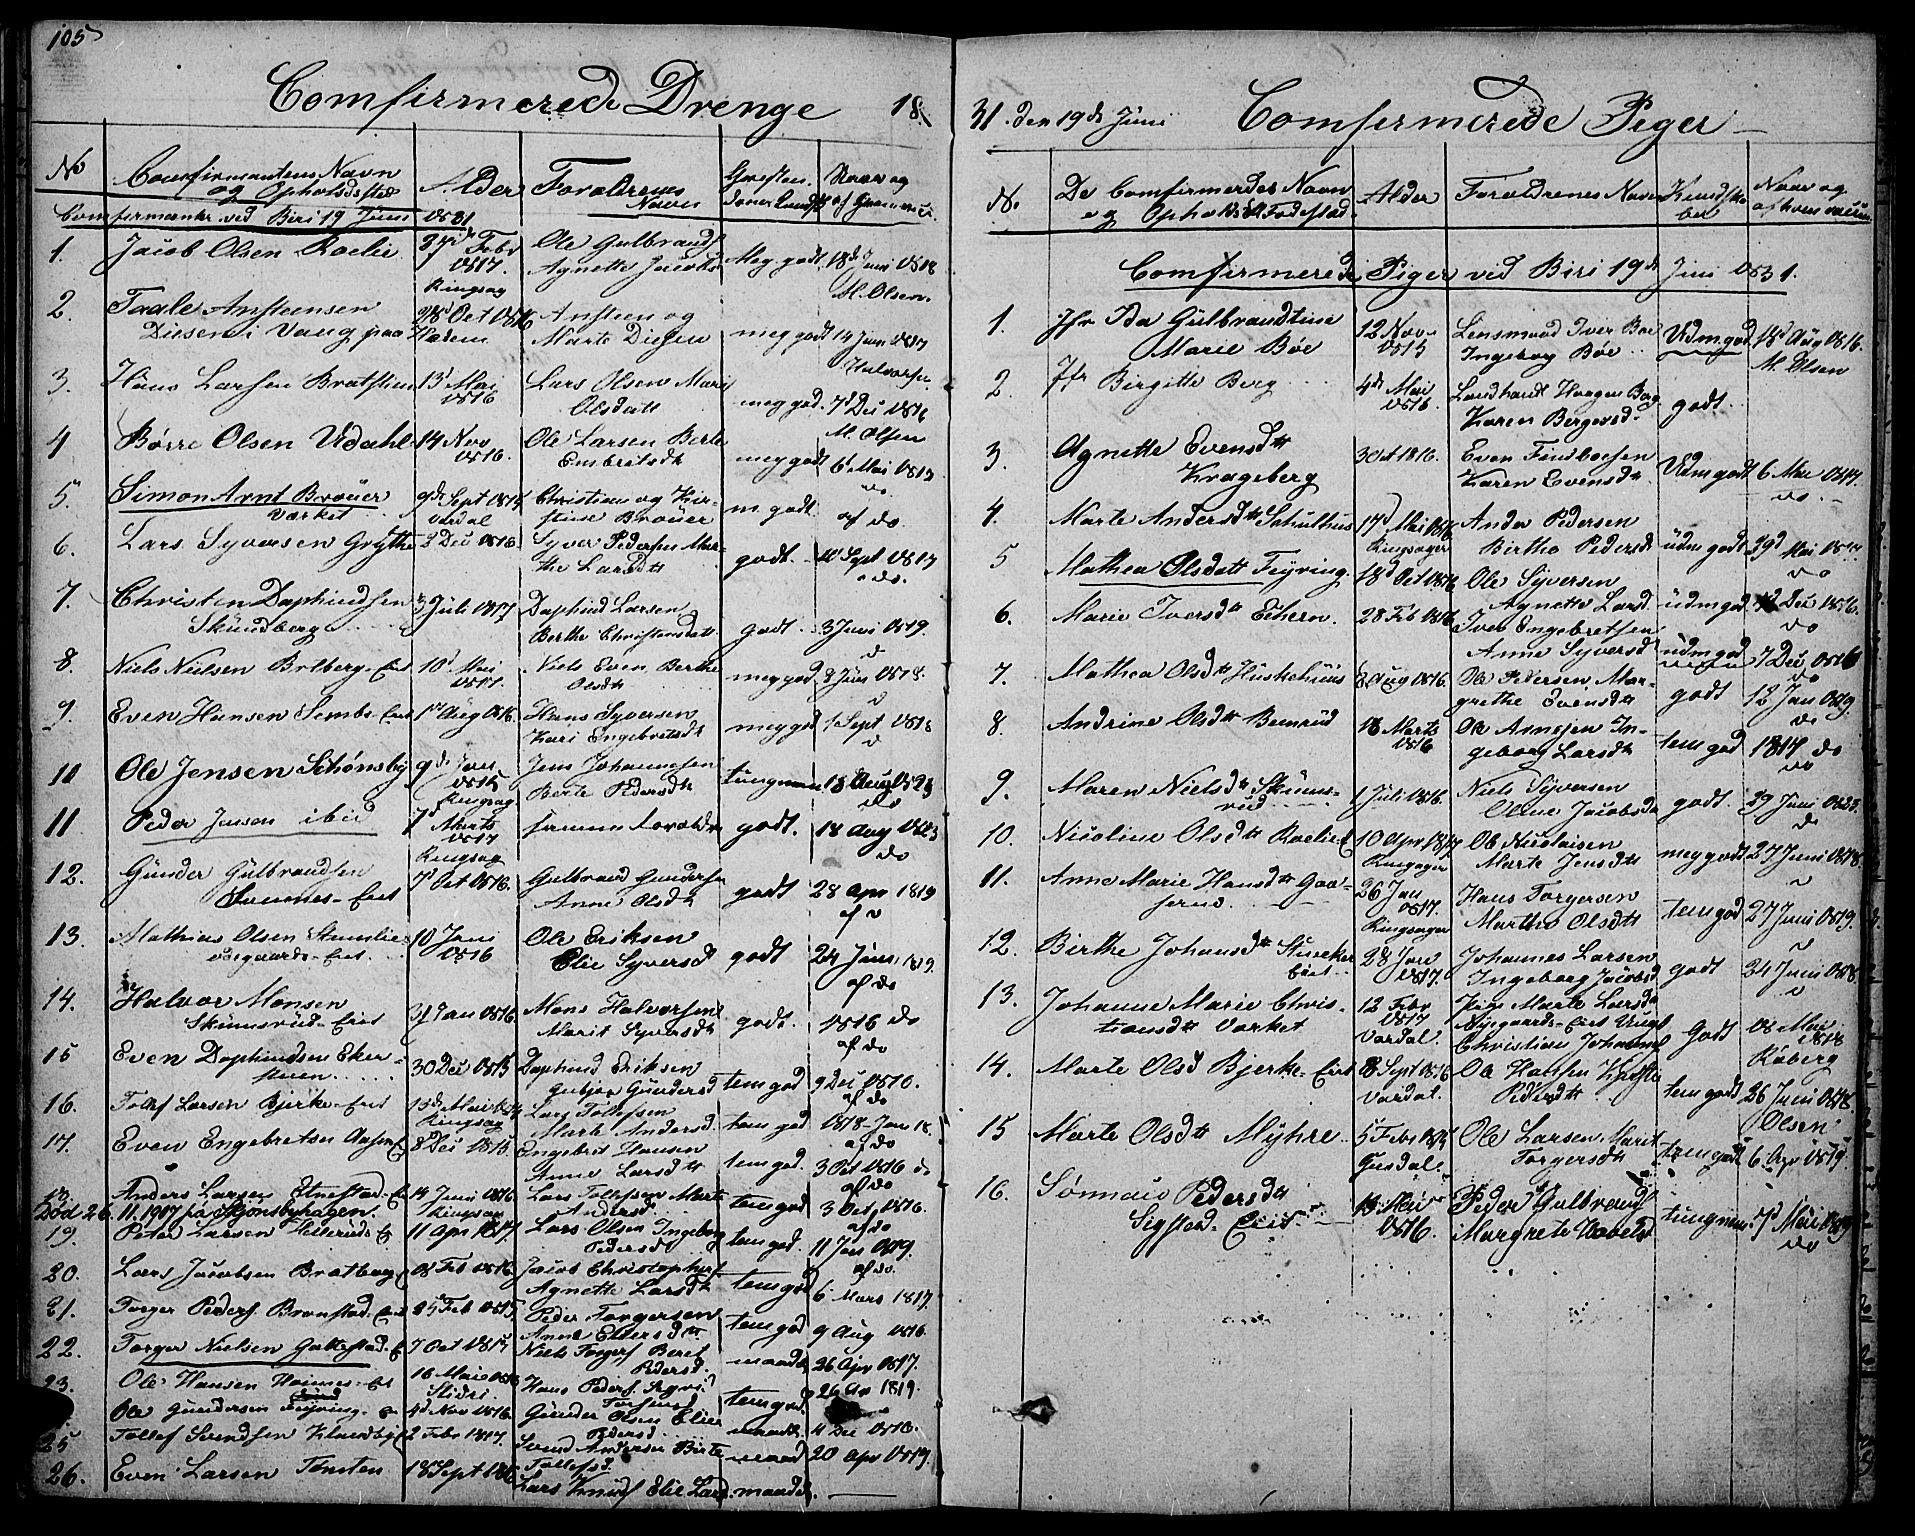 SAH, Biri prestekontor, Ministerialbok nr. 4, 1829-1842, s. 105